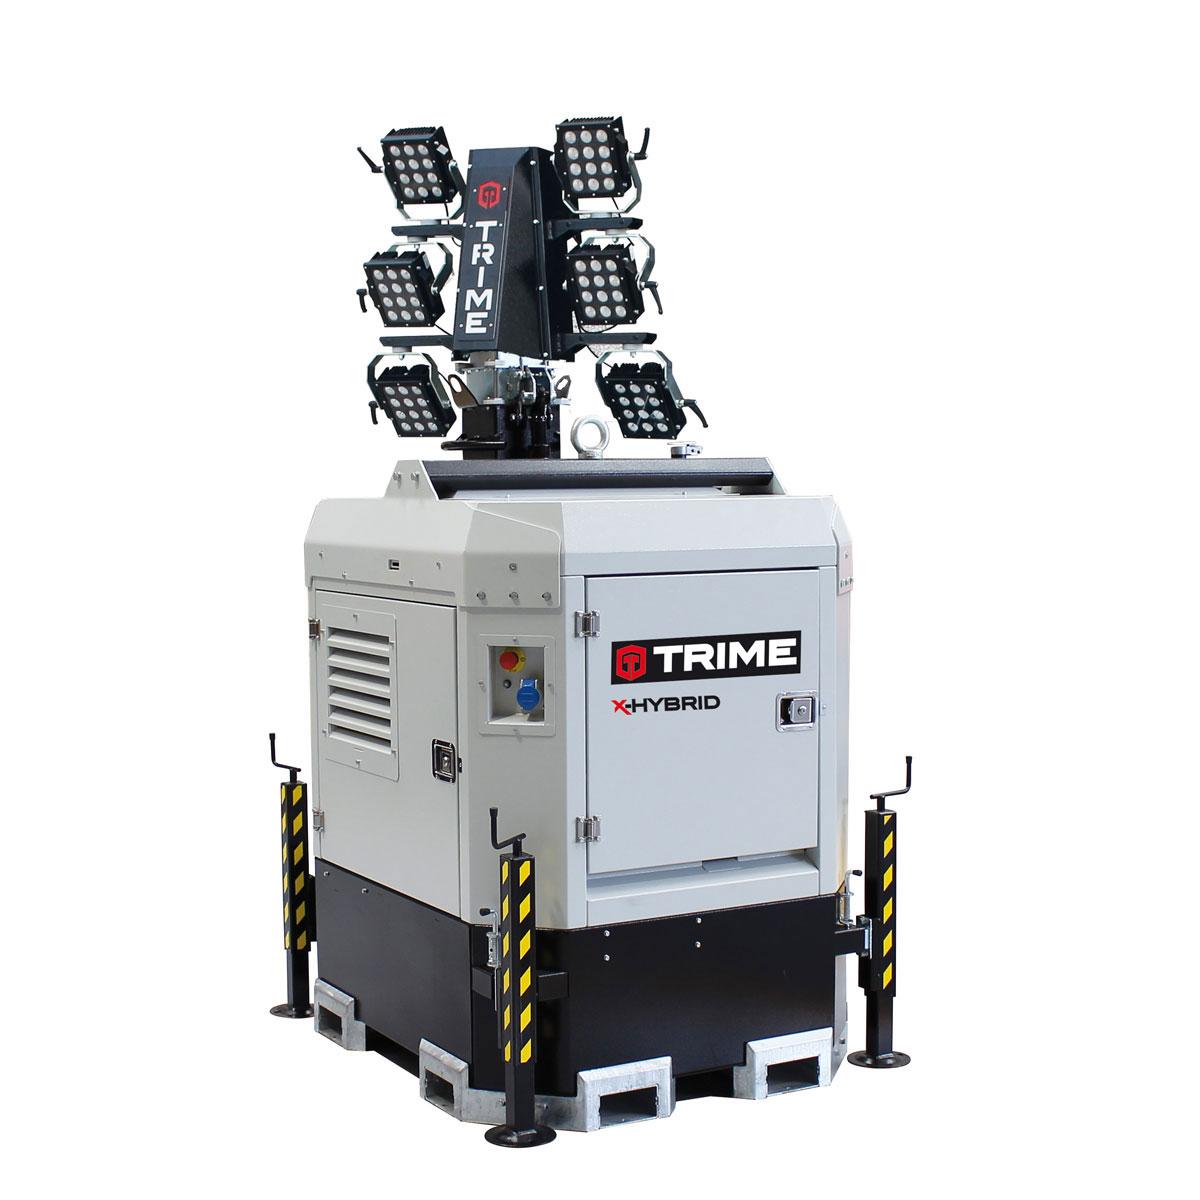 belysningsmast-led-x-hybrid-6x150W-stangd